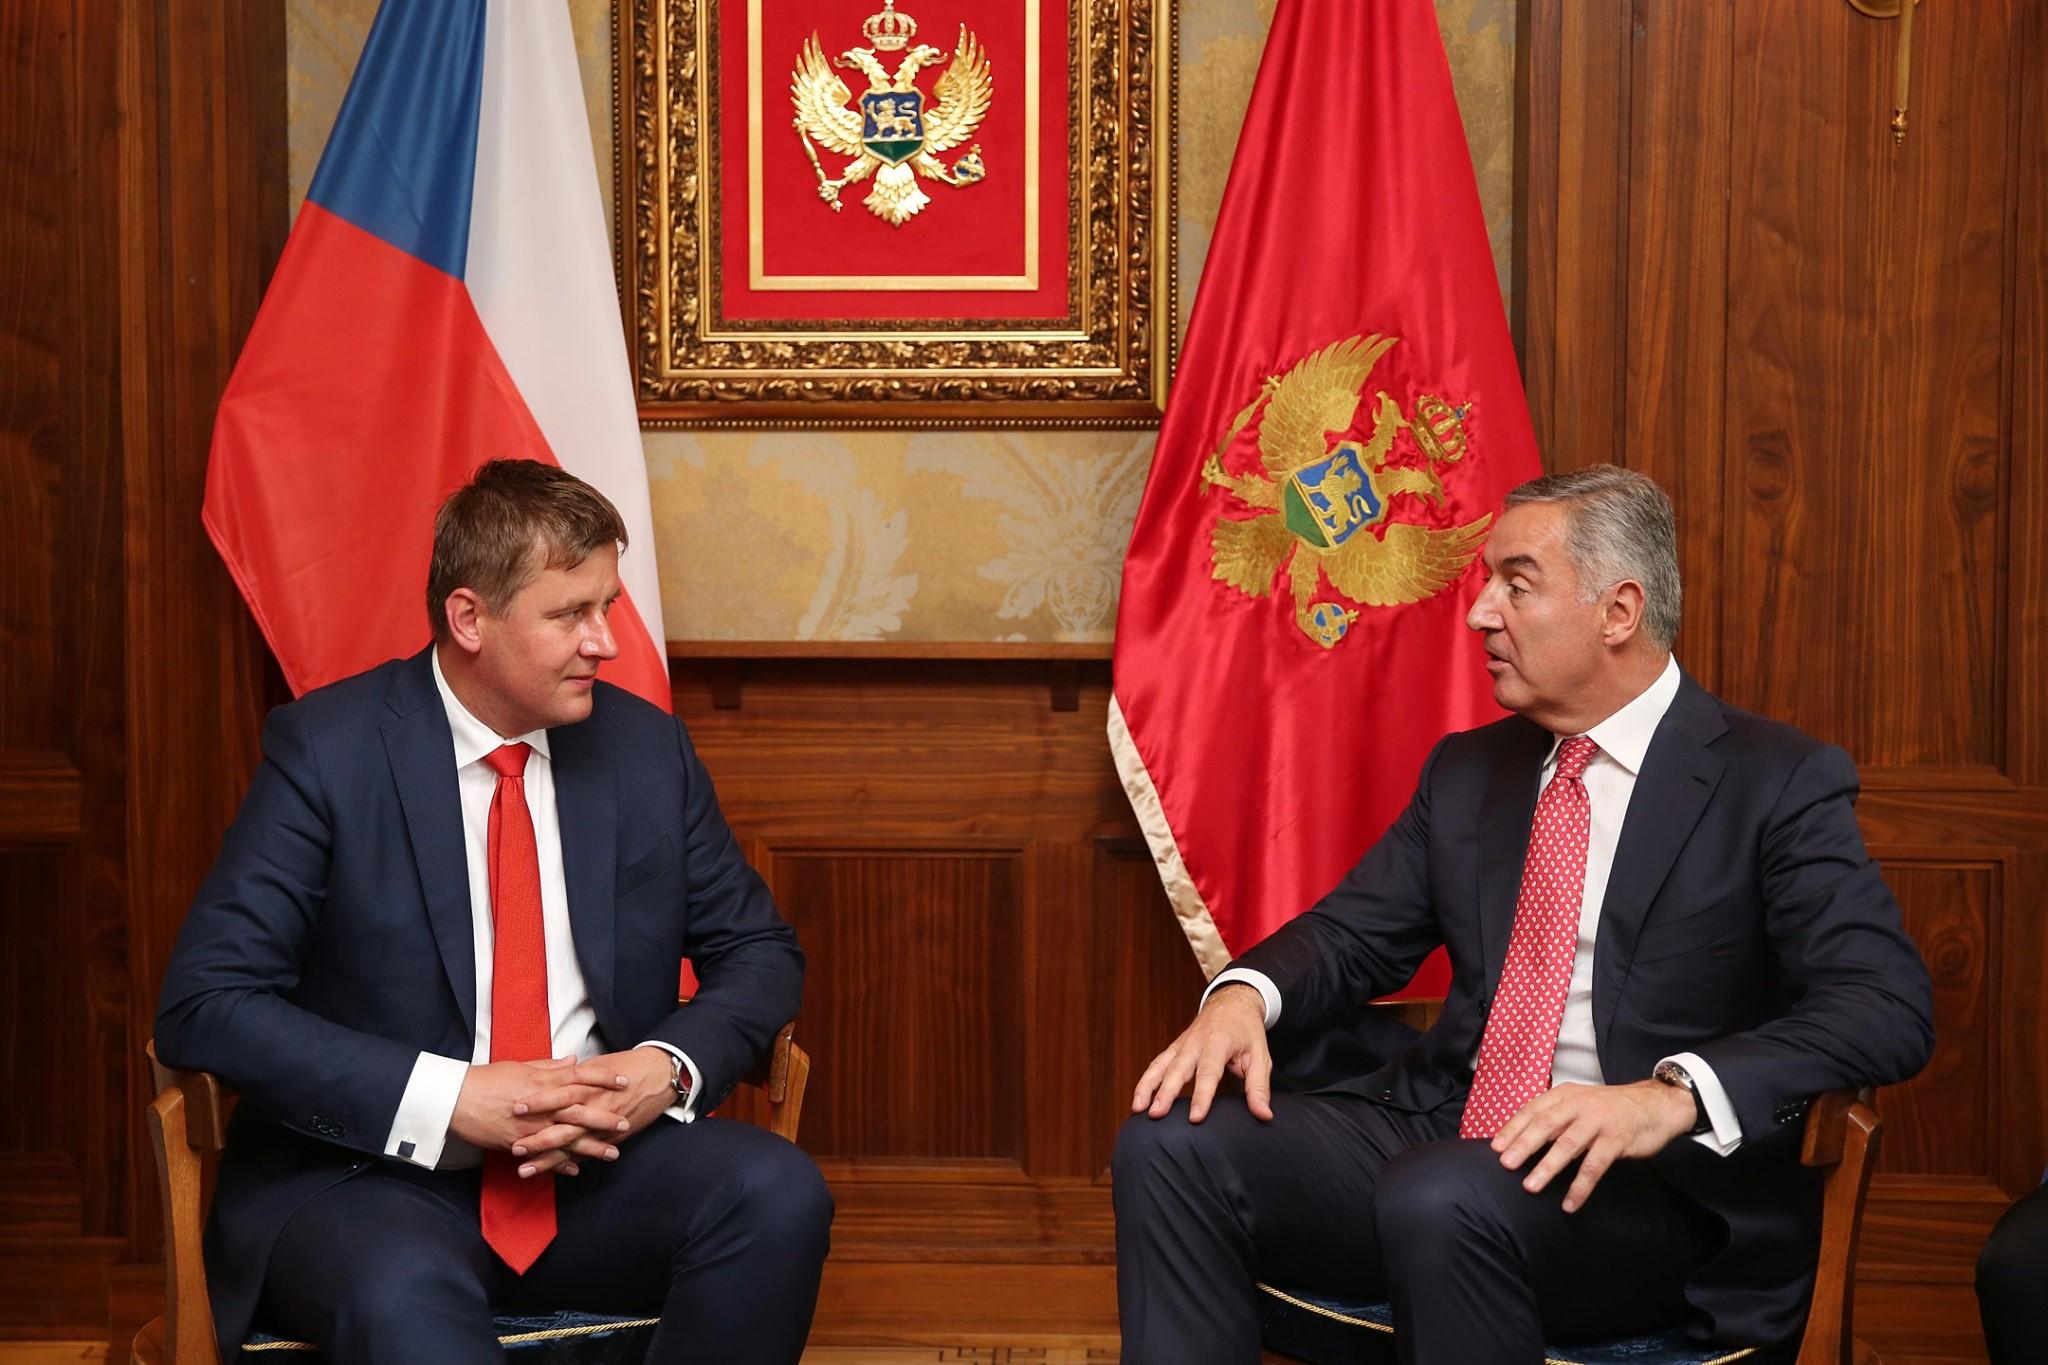 Czech Republic FM Tomaš Petriček in an official visit to Montenegro